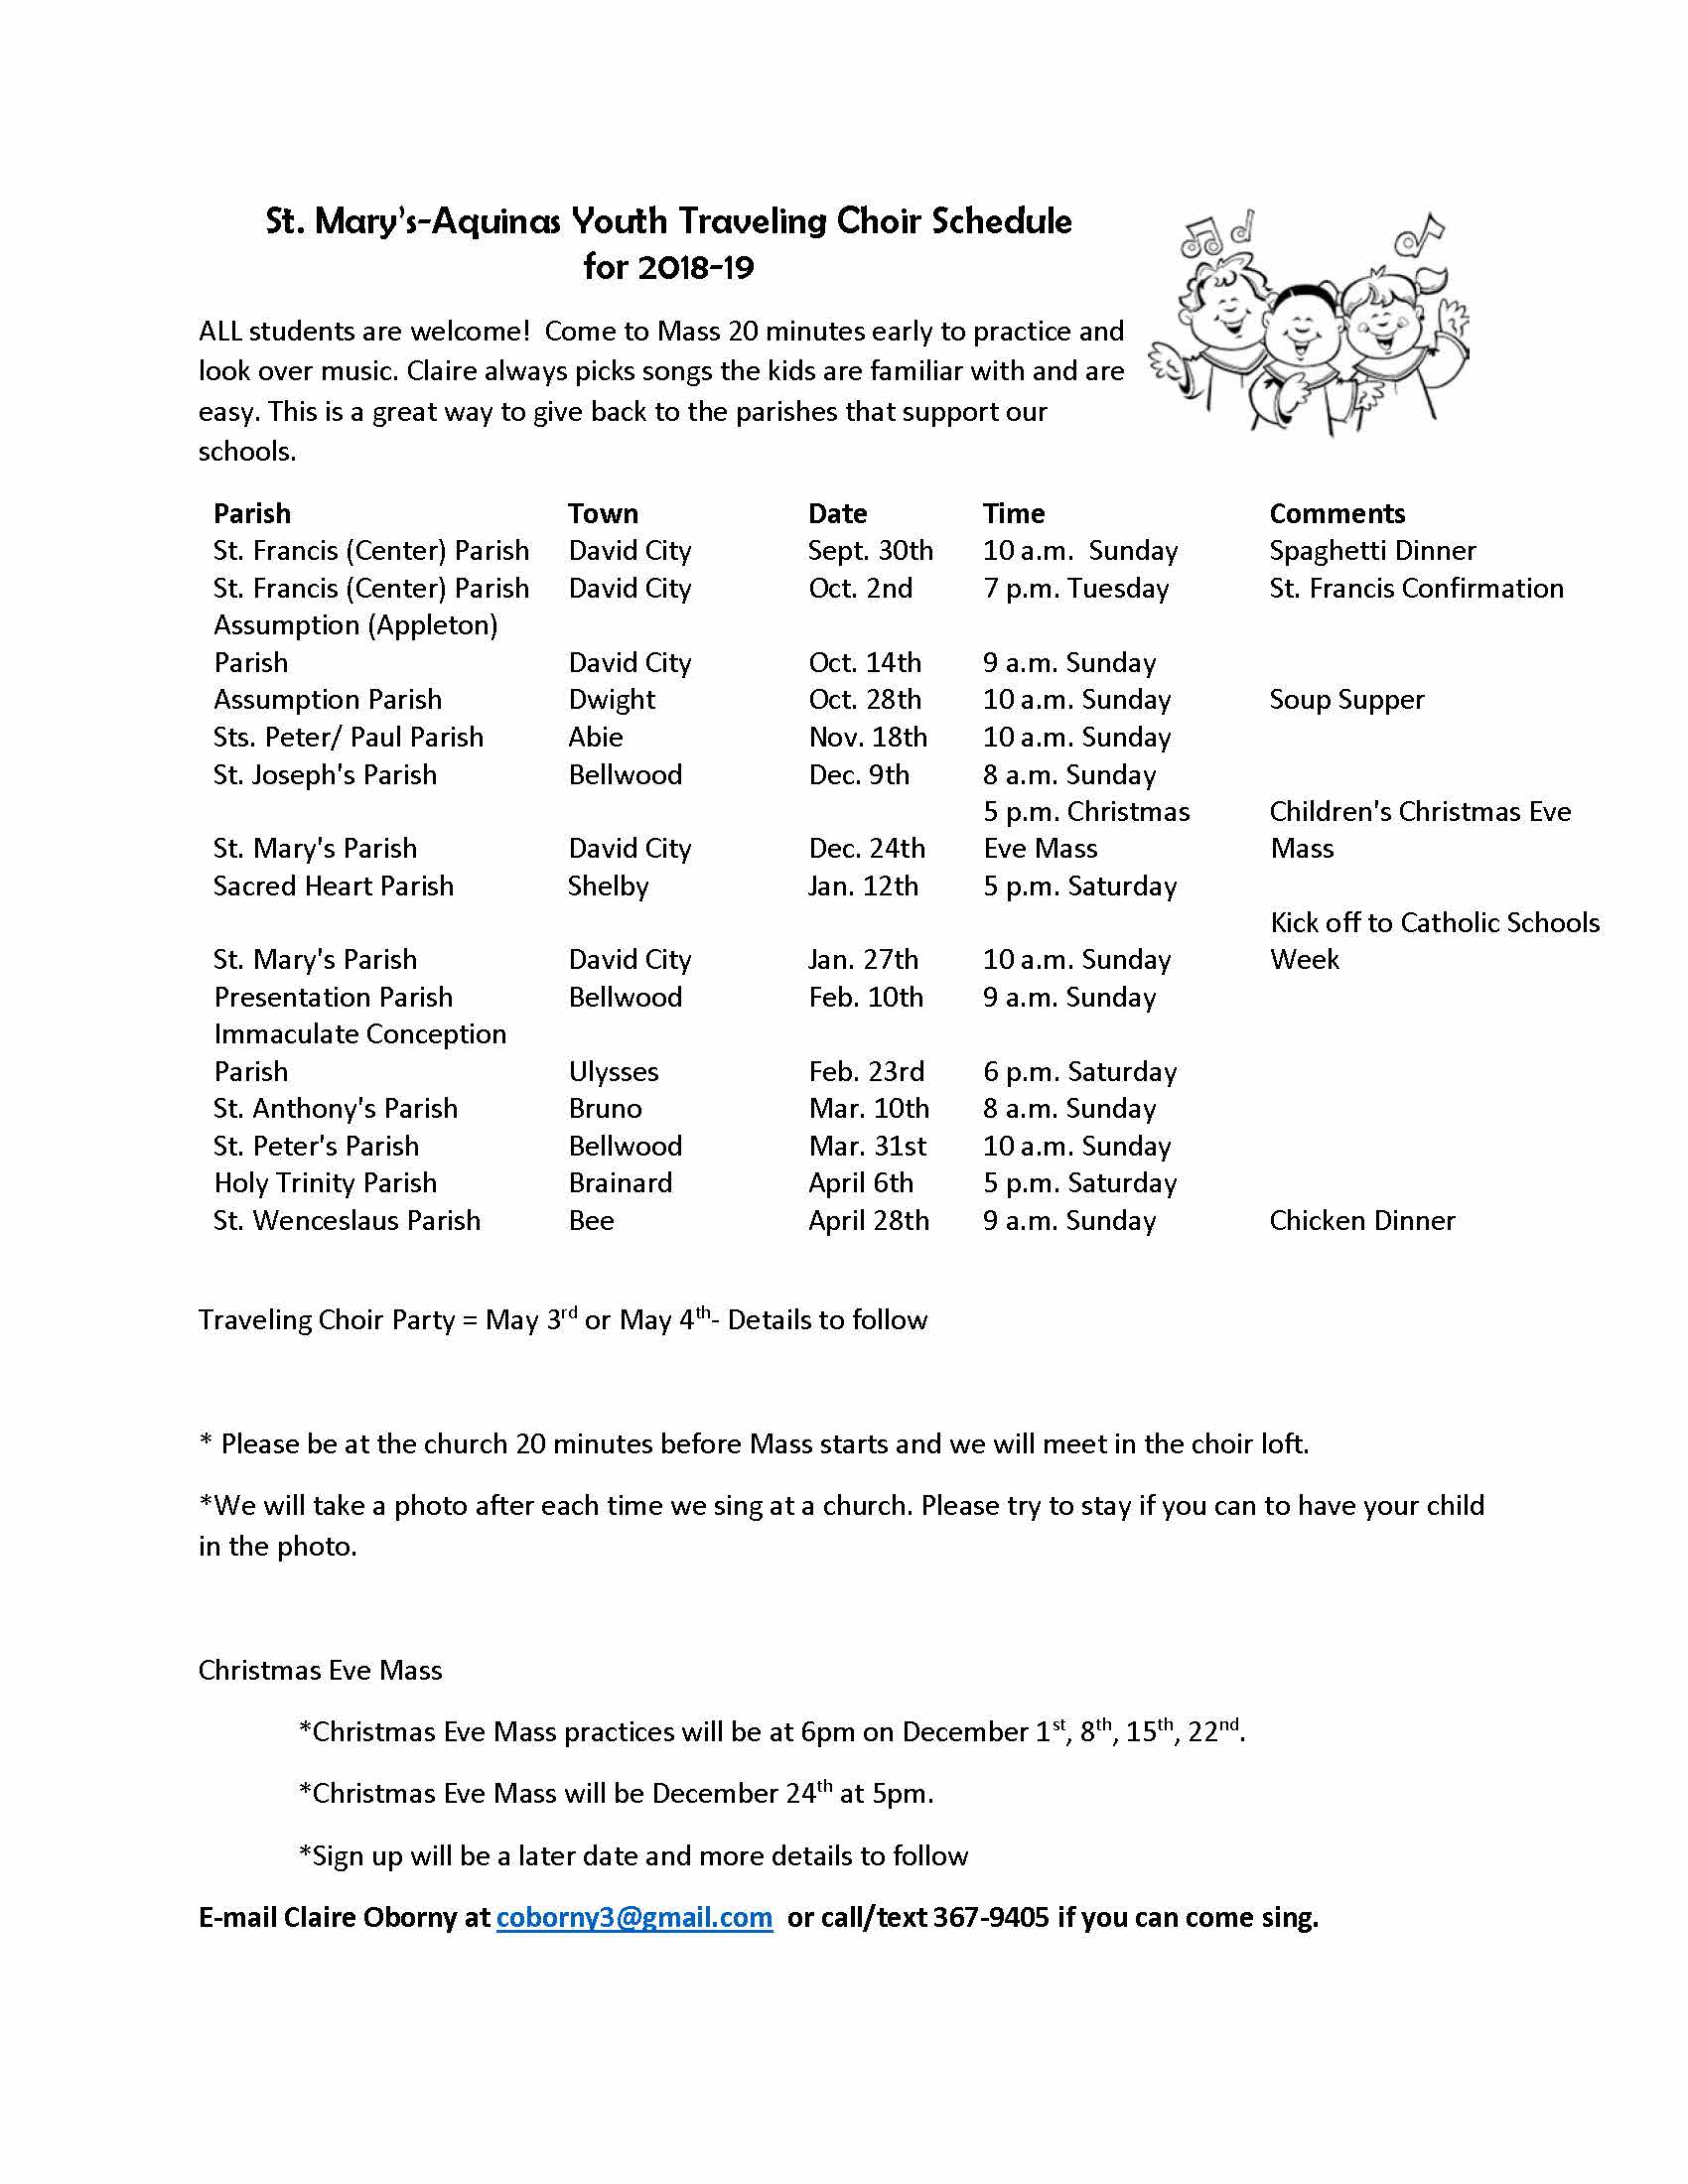 Aquinas & St  Mary's Catholic Schools » Traveling Choir